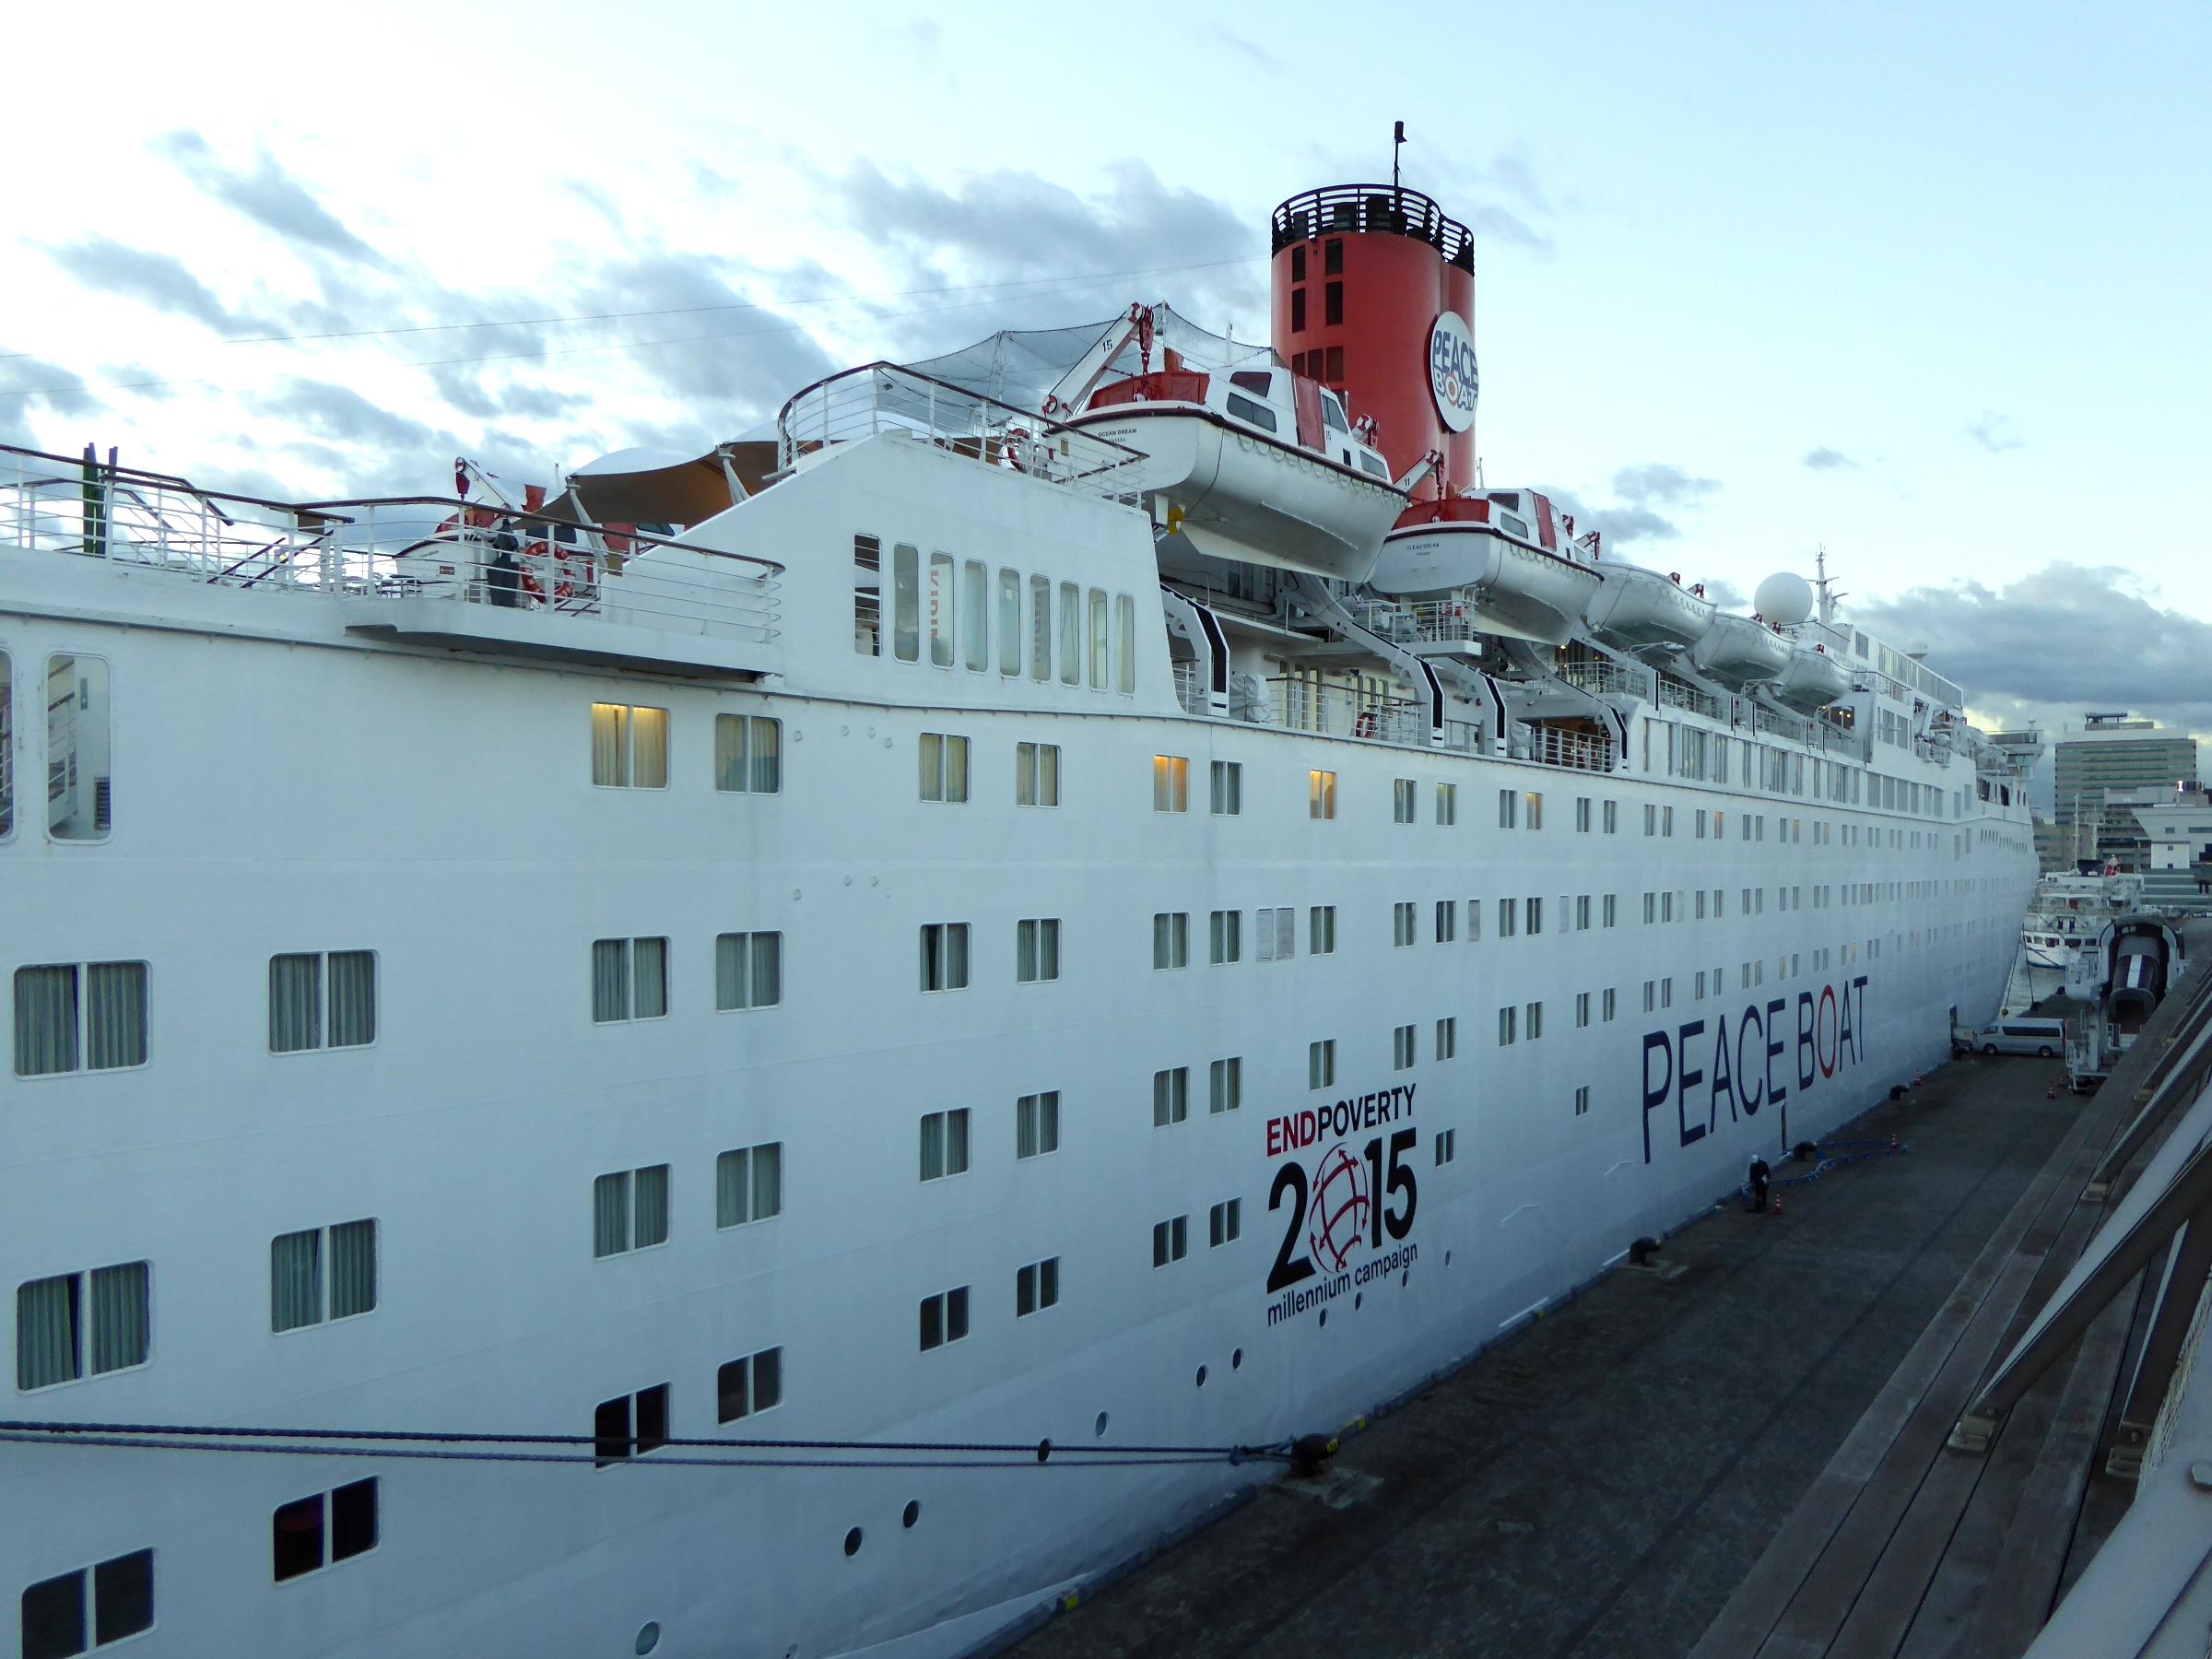 file ocean dream cruise ship yokohama port japan 横浜港 大桟橋